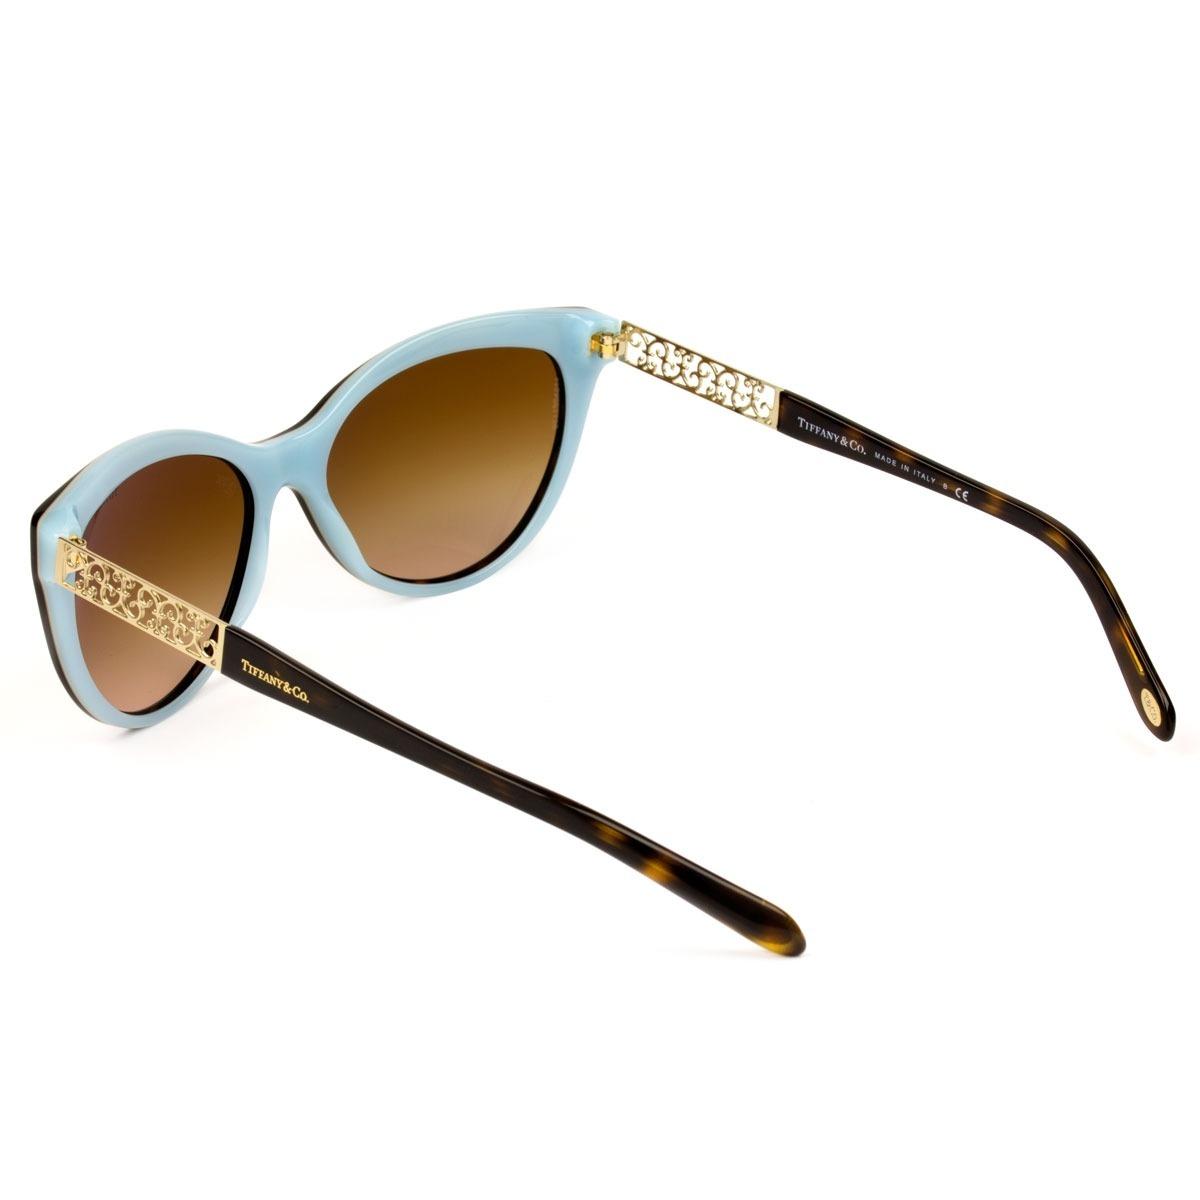 8be5c2802 óculos de sol tiffany & co tf 4119 8134/3b 56 - nota fiscal. Carregando  zoom.